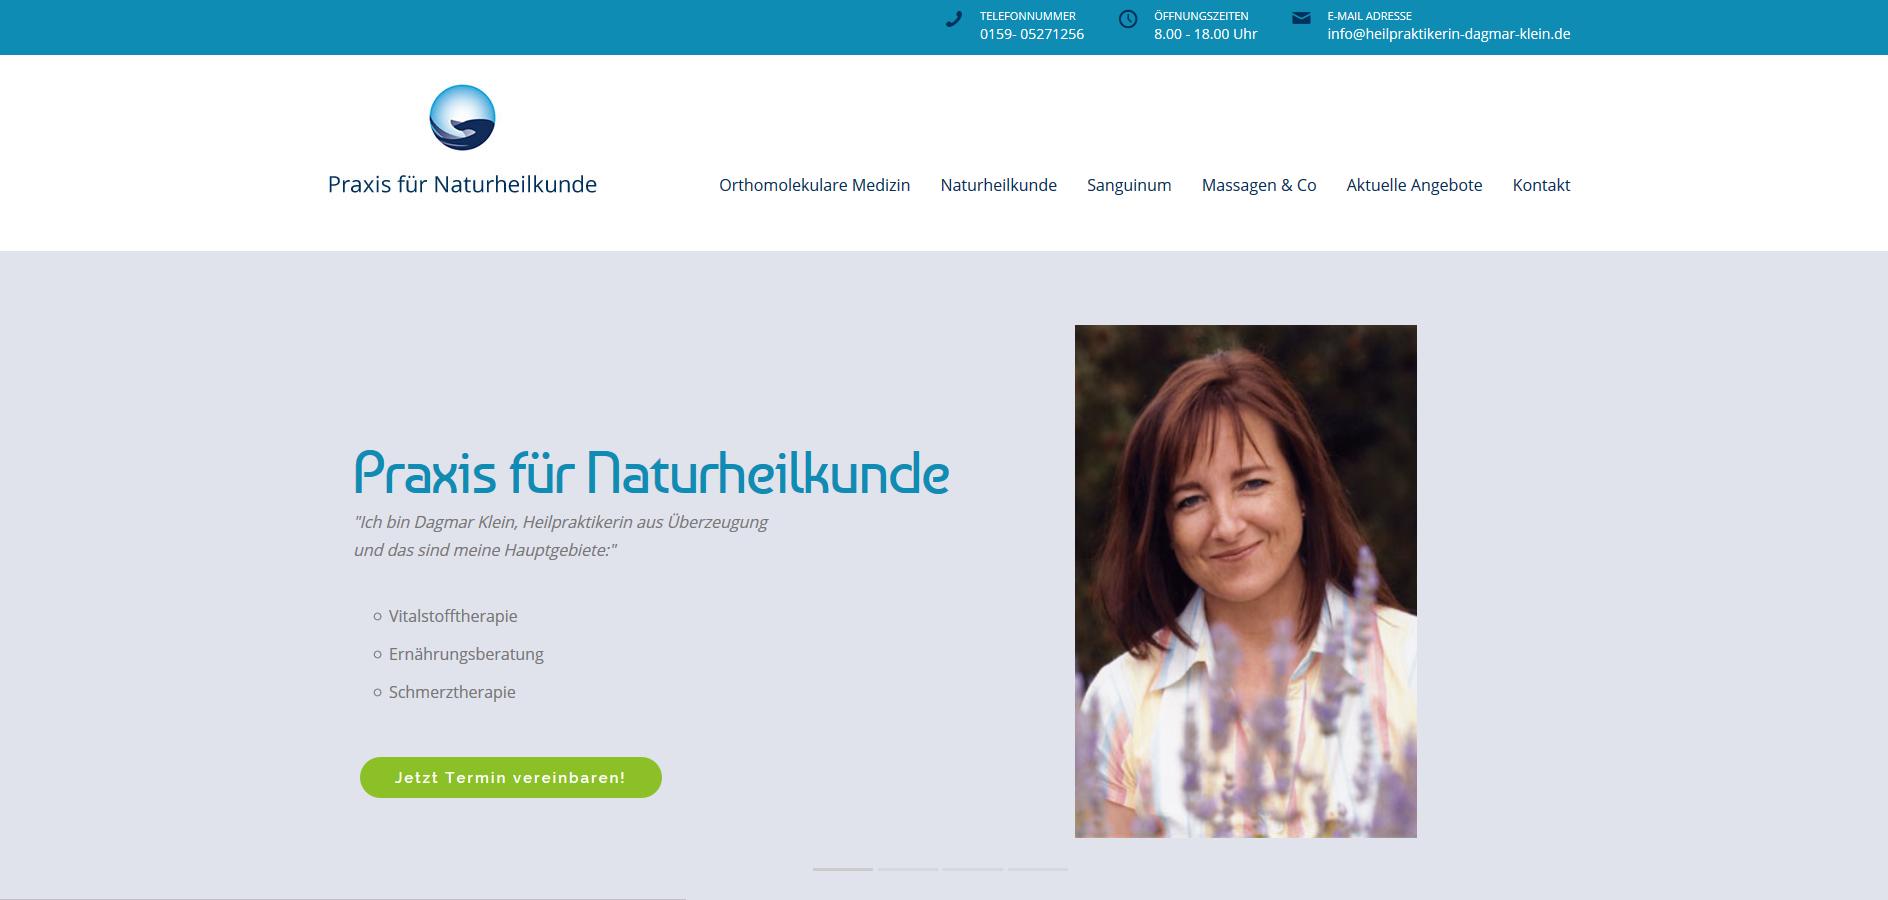 Heilpraktikerin Dagmar Klein